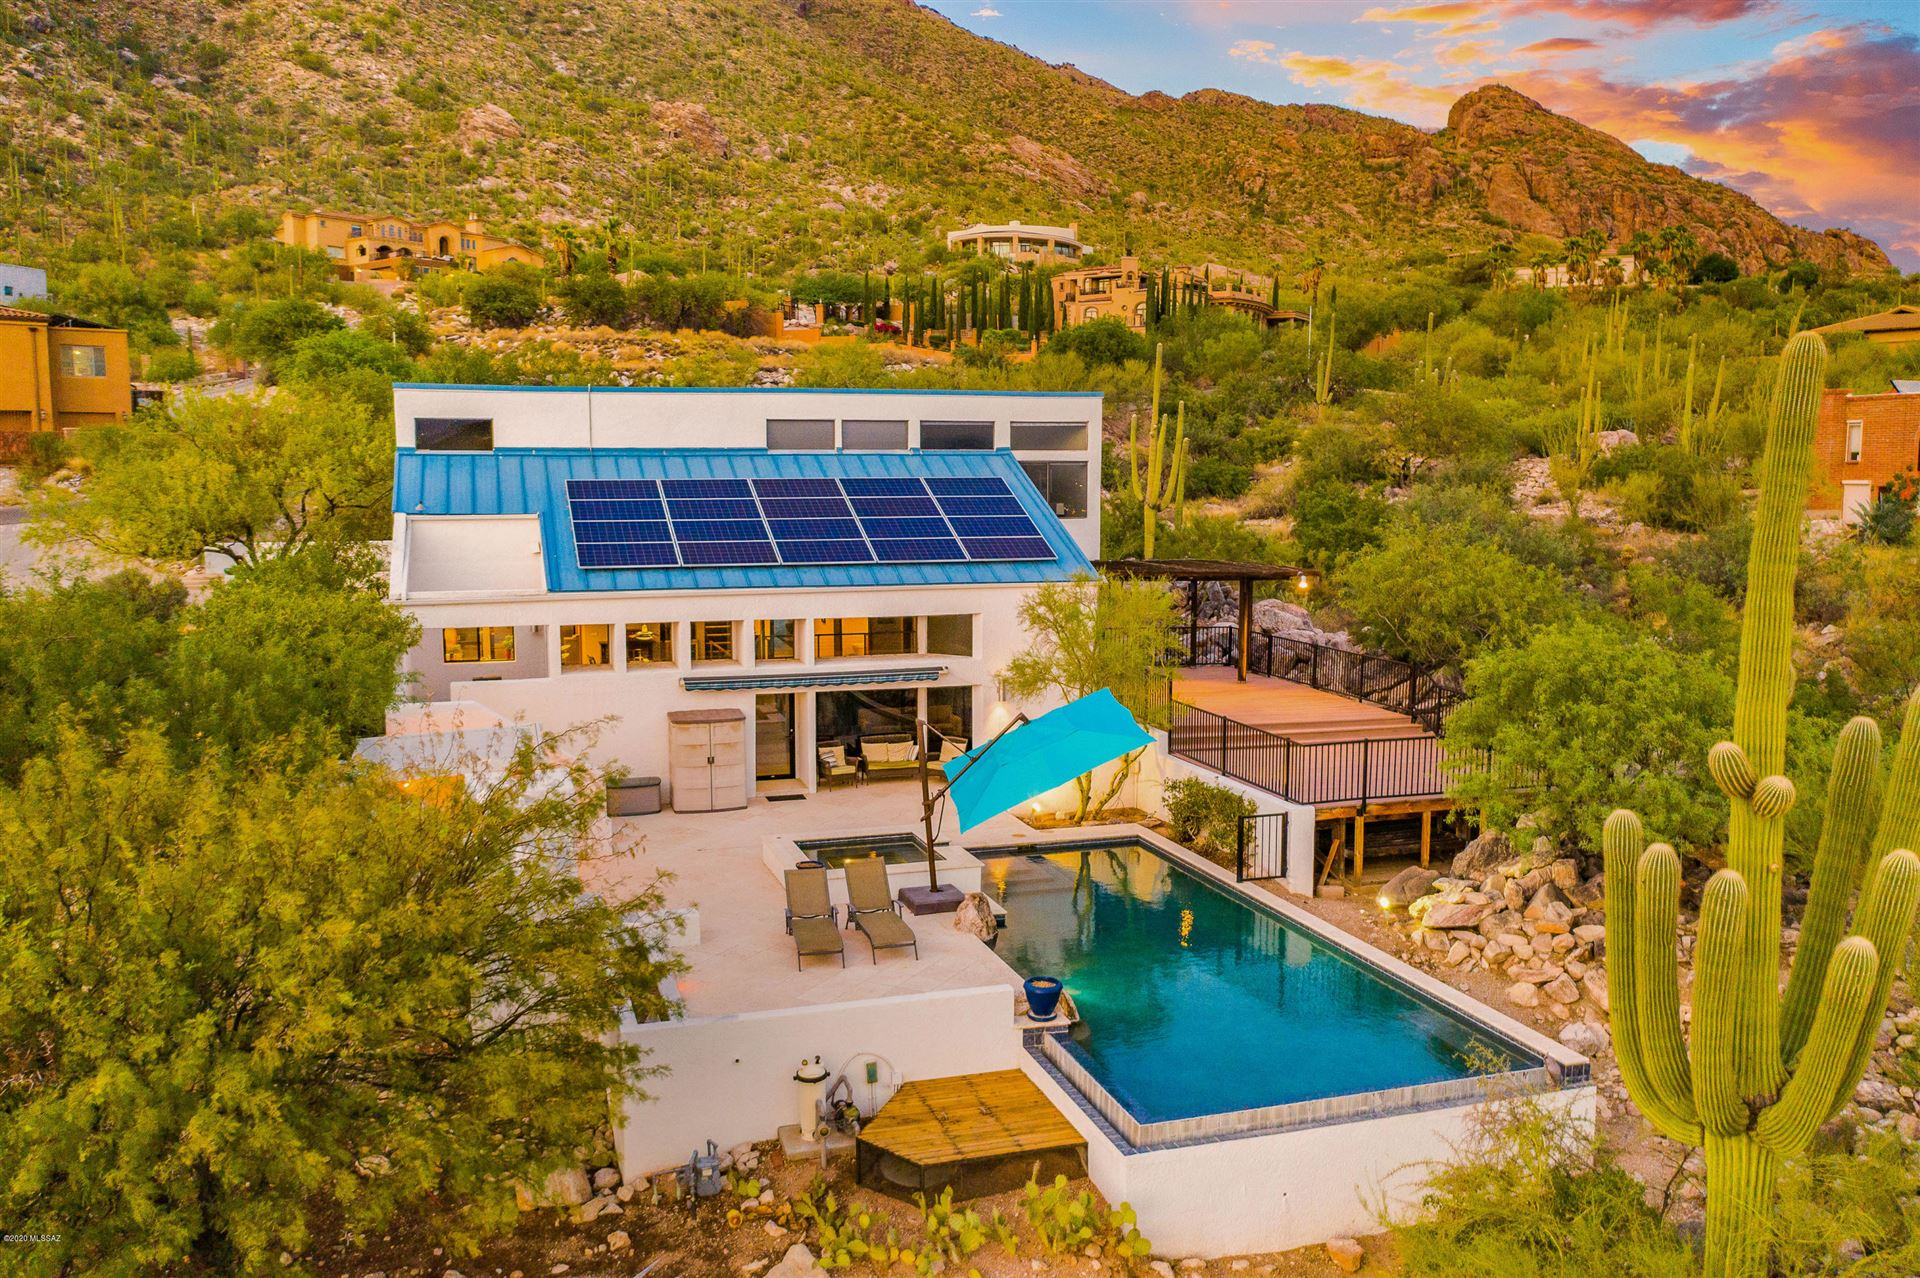 4560 E Ina Road, Tucson, AZ 85718 - MLS#: 22023486